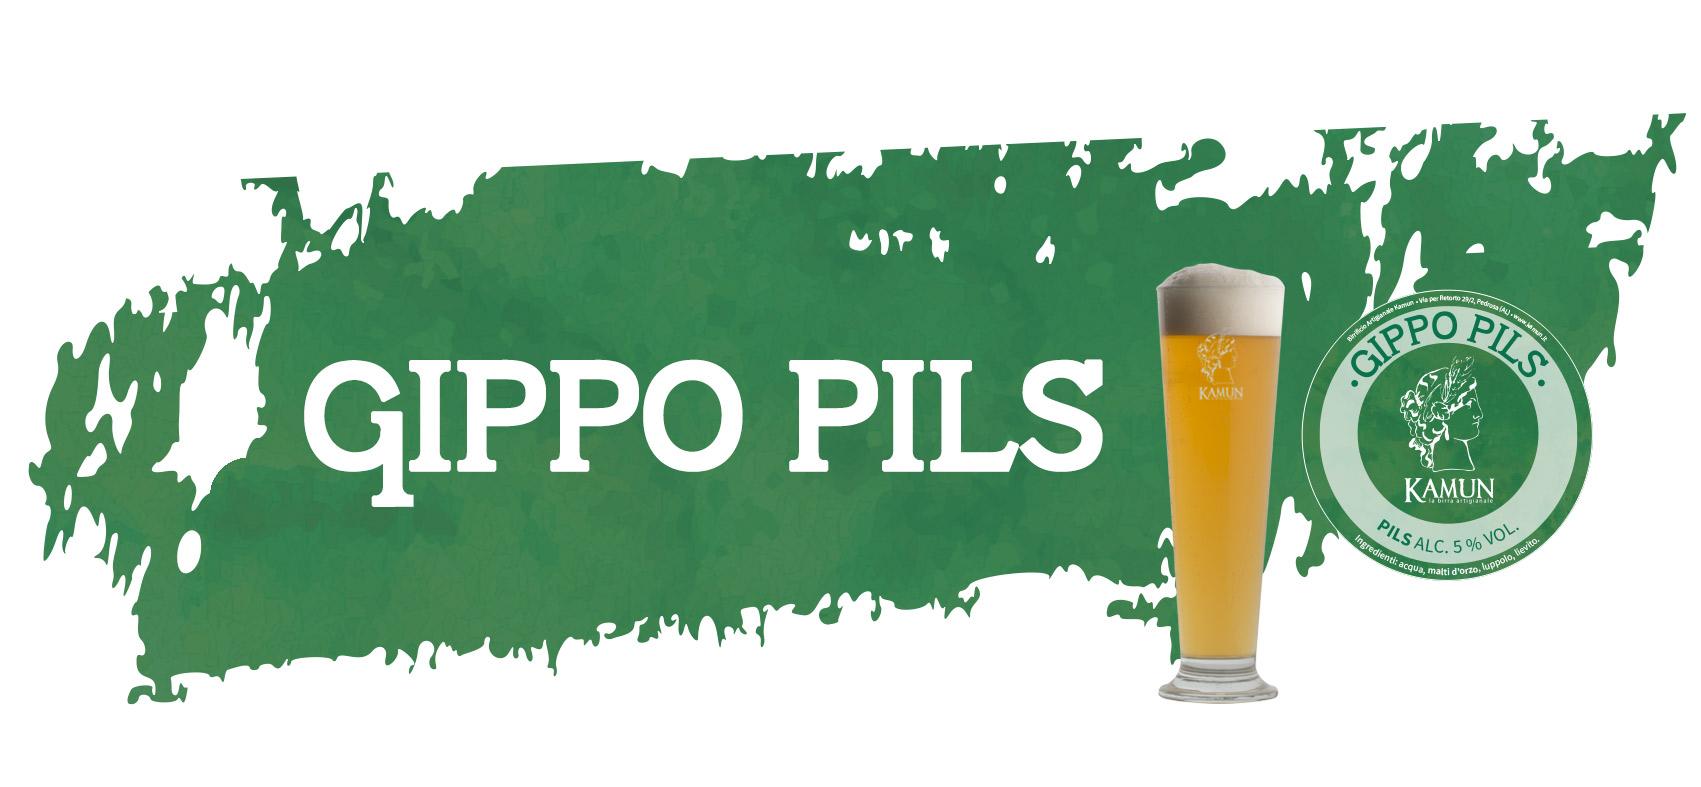 gippo-pills-title